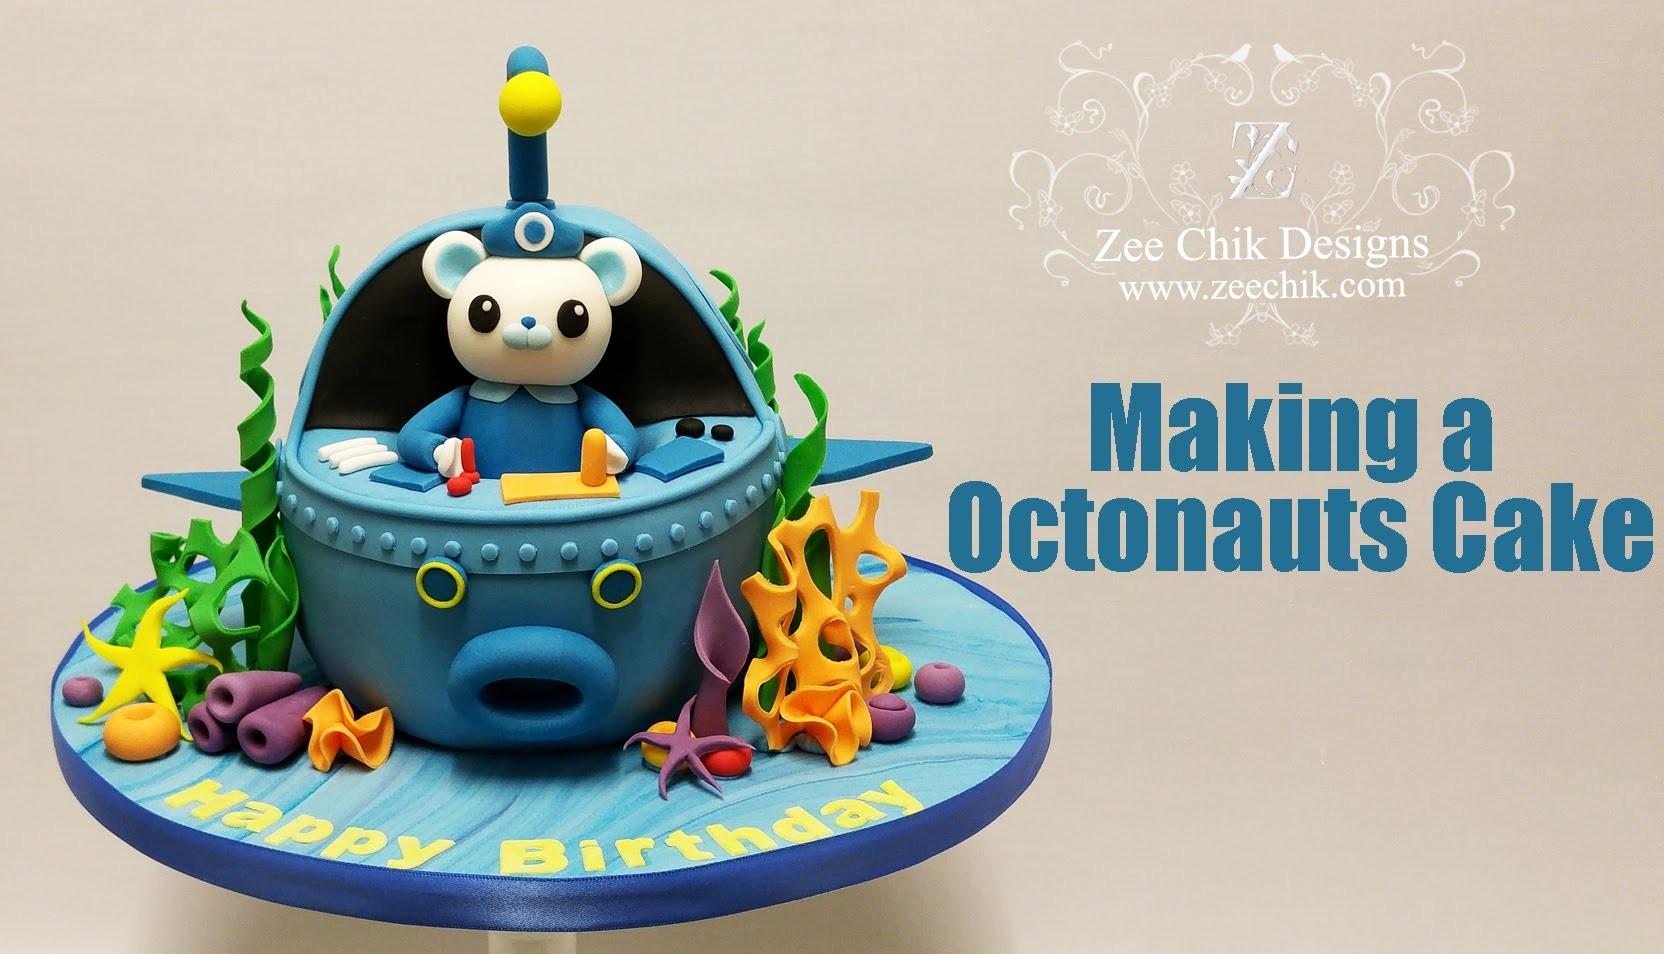 How to make a Octonauts Cake